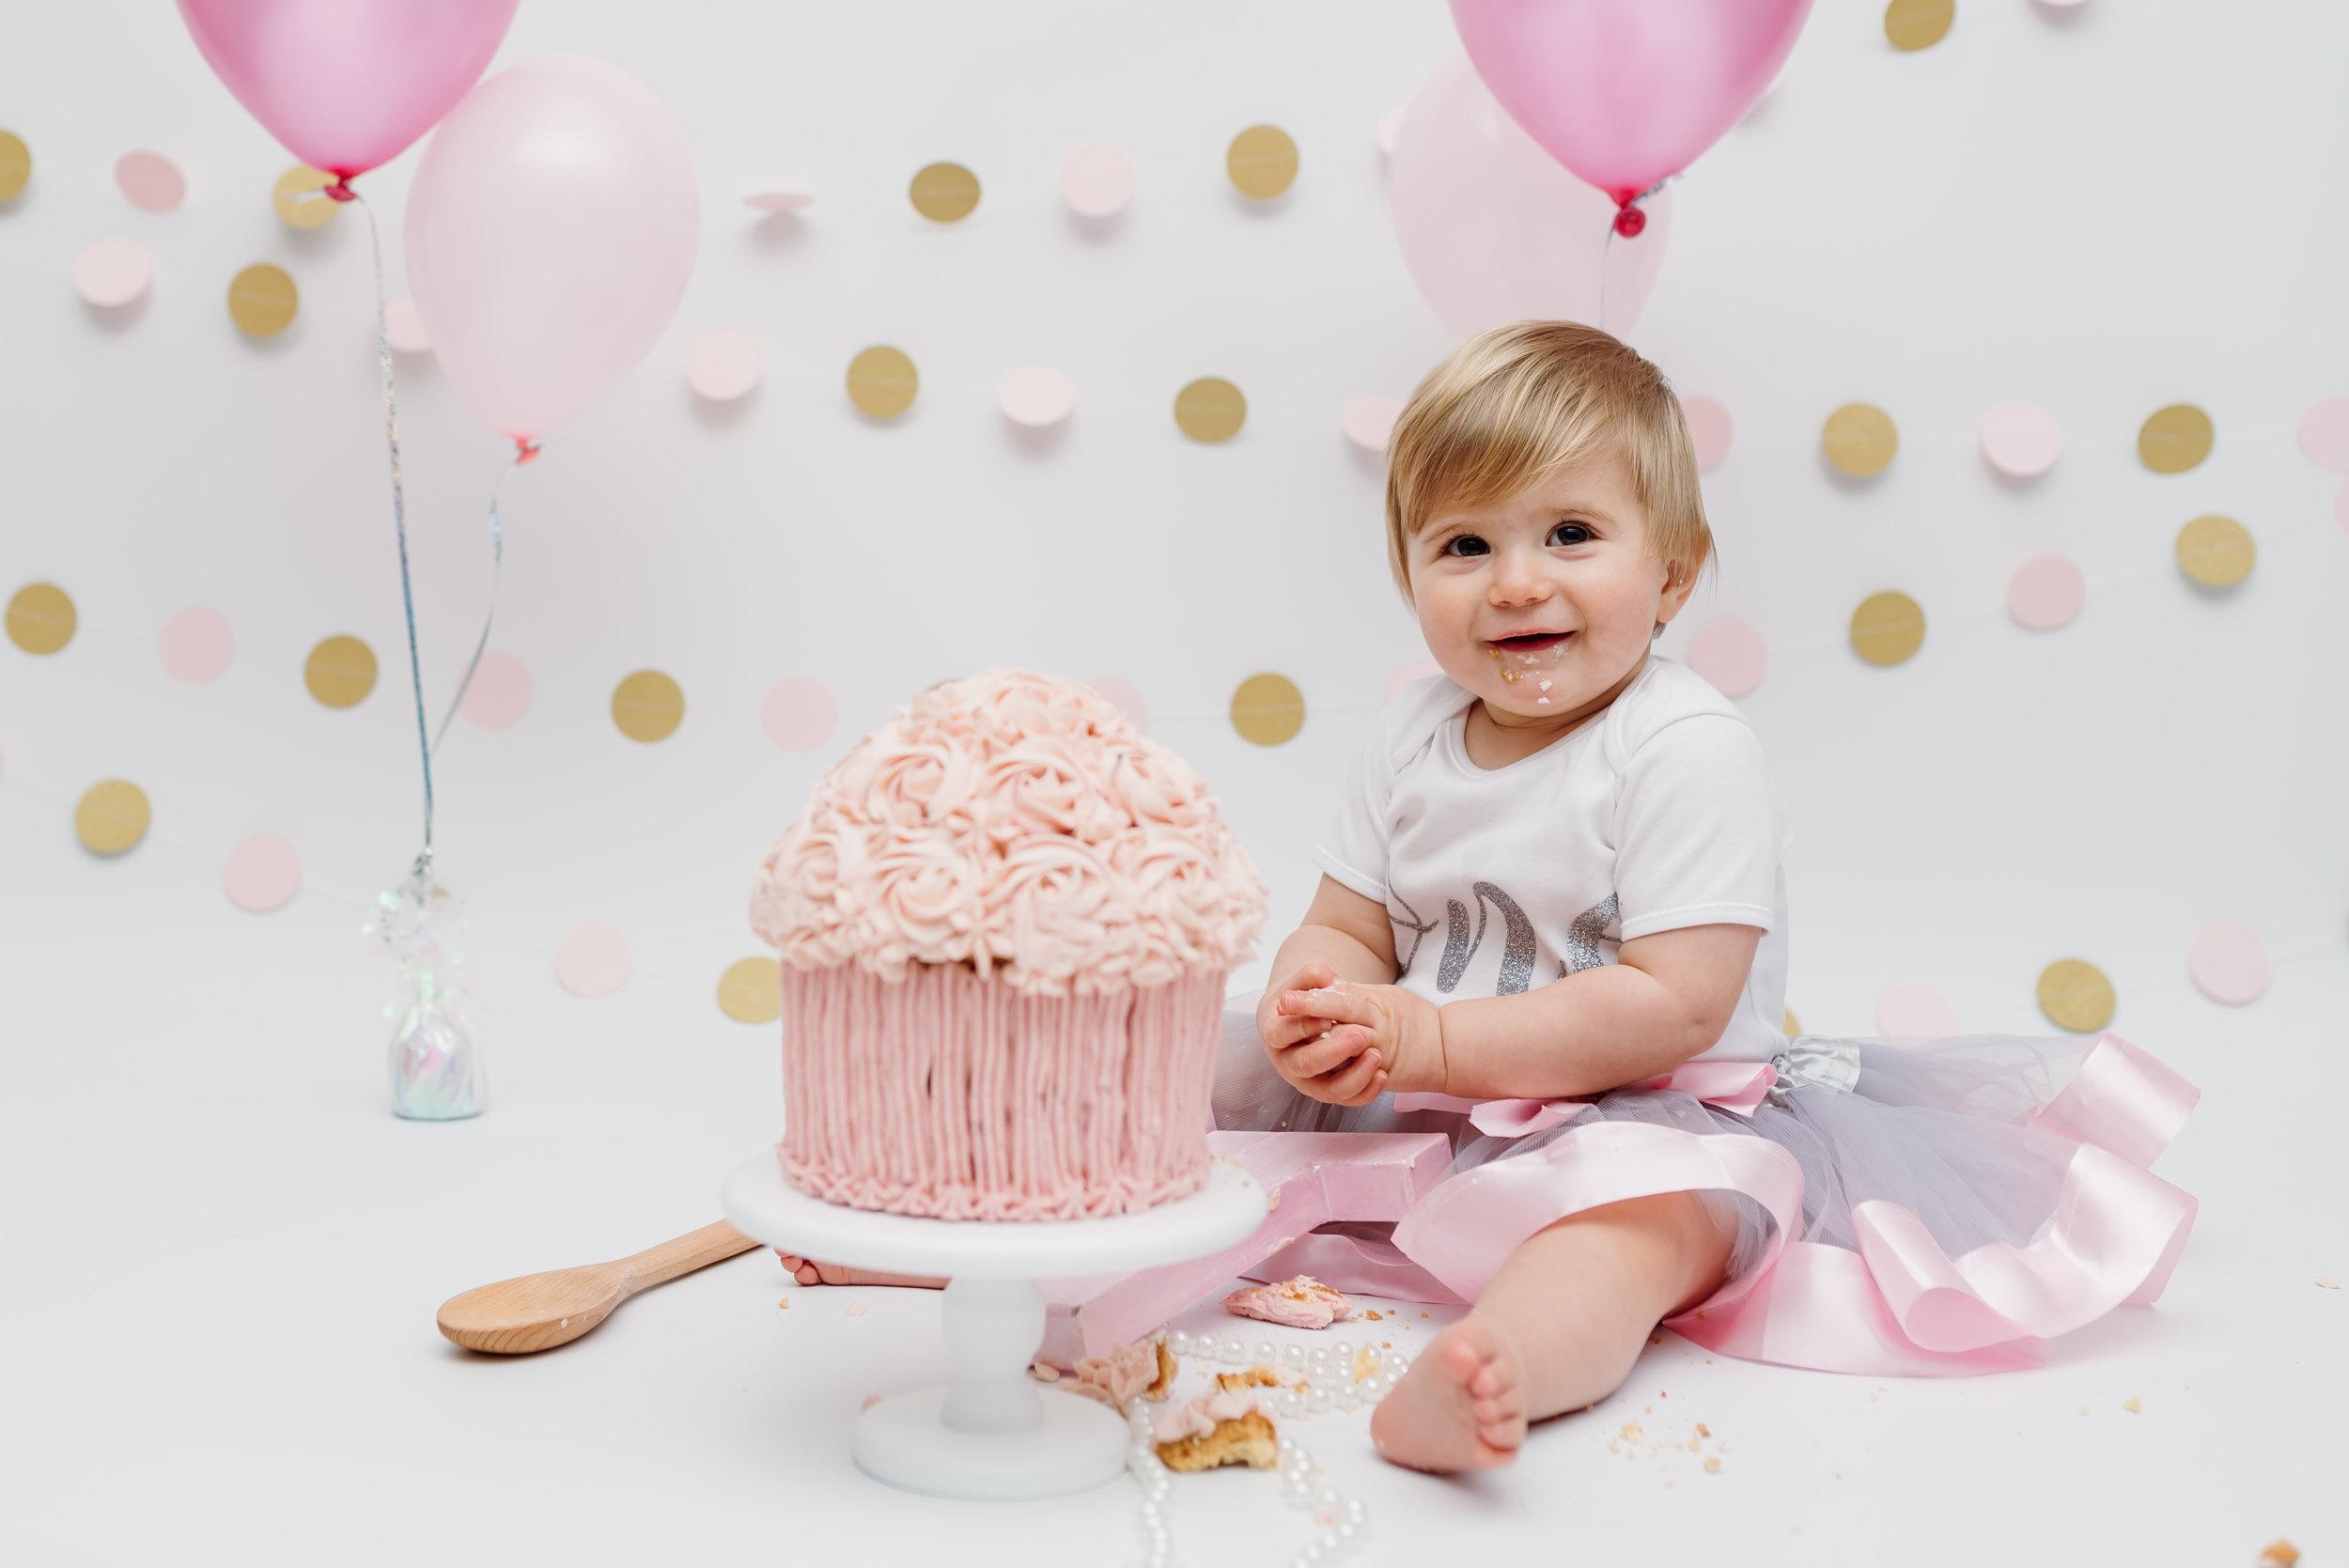 turning 1 year old - cake smash